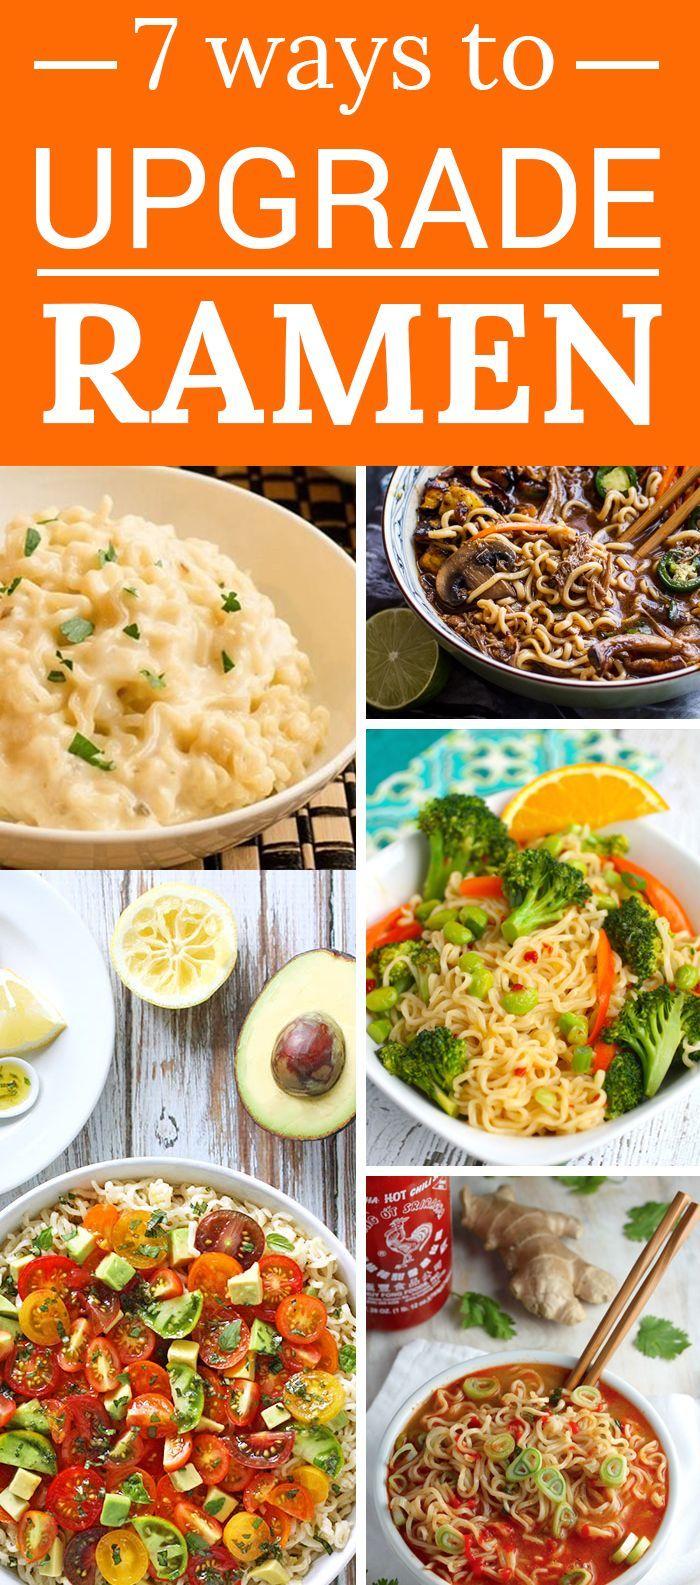 ... Rice recipes on Pinterest | Risotto, Ramen and Ramen noodle recipes